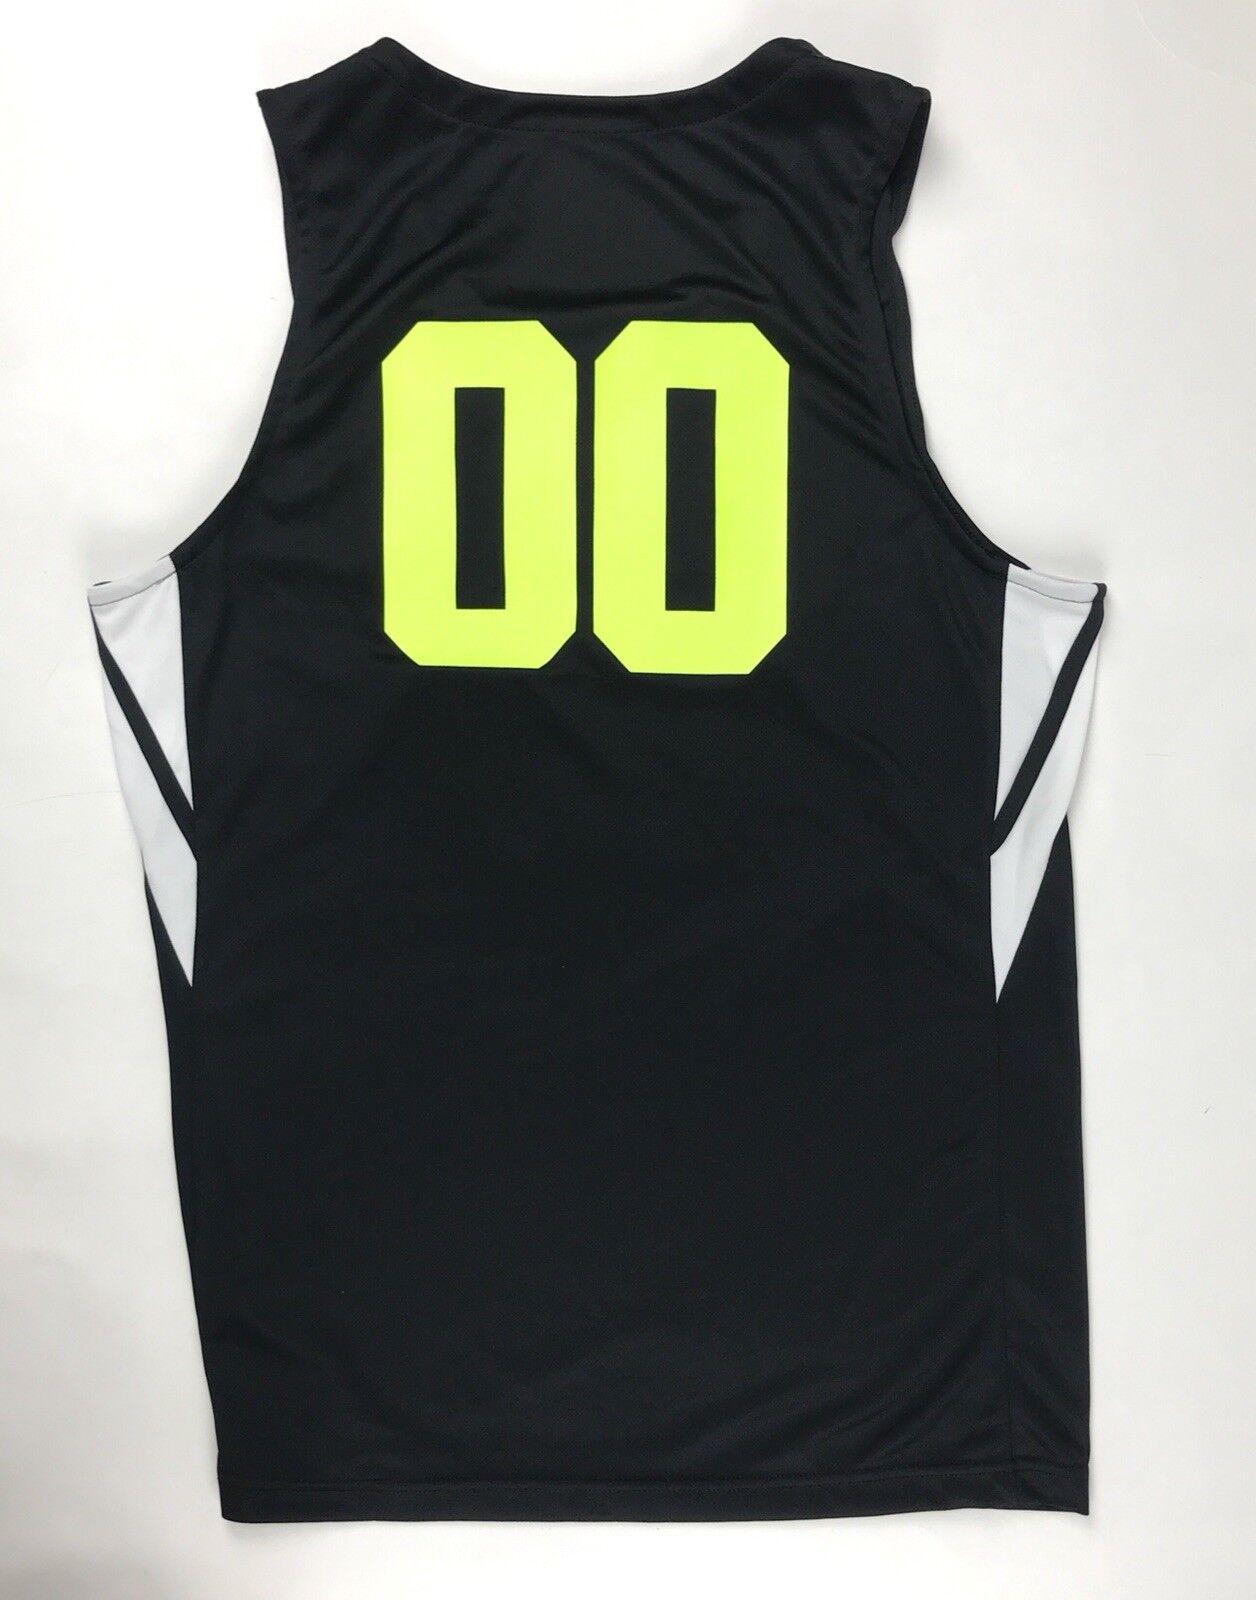 987cc375d9d3 Details about New Nike Baylor University Bears Stock Basketball Jersey  Men s L 932177 Black